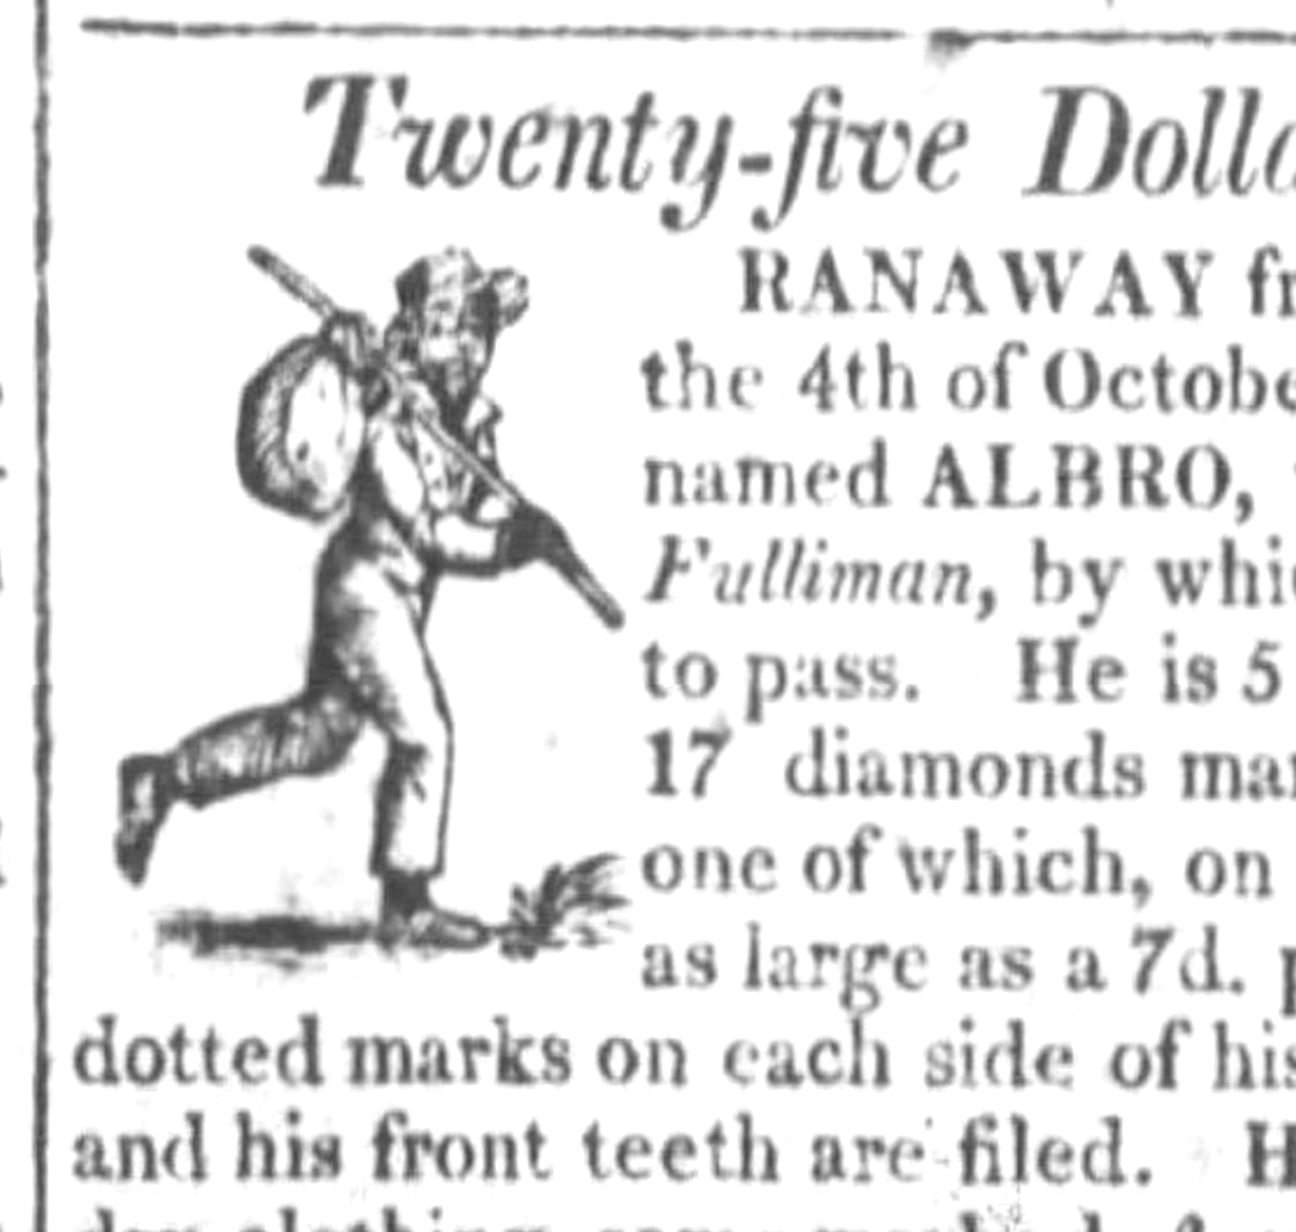 Murder and Manhunt in 1820: Albro's Flight from Slavery, Part 1